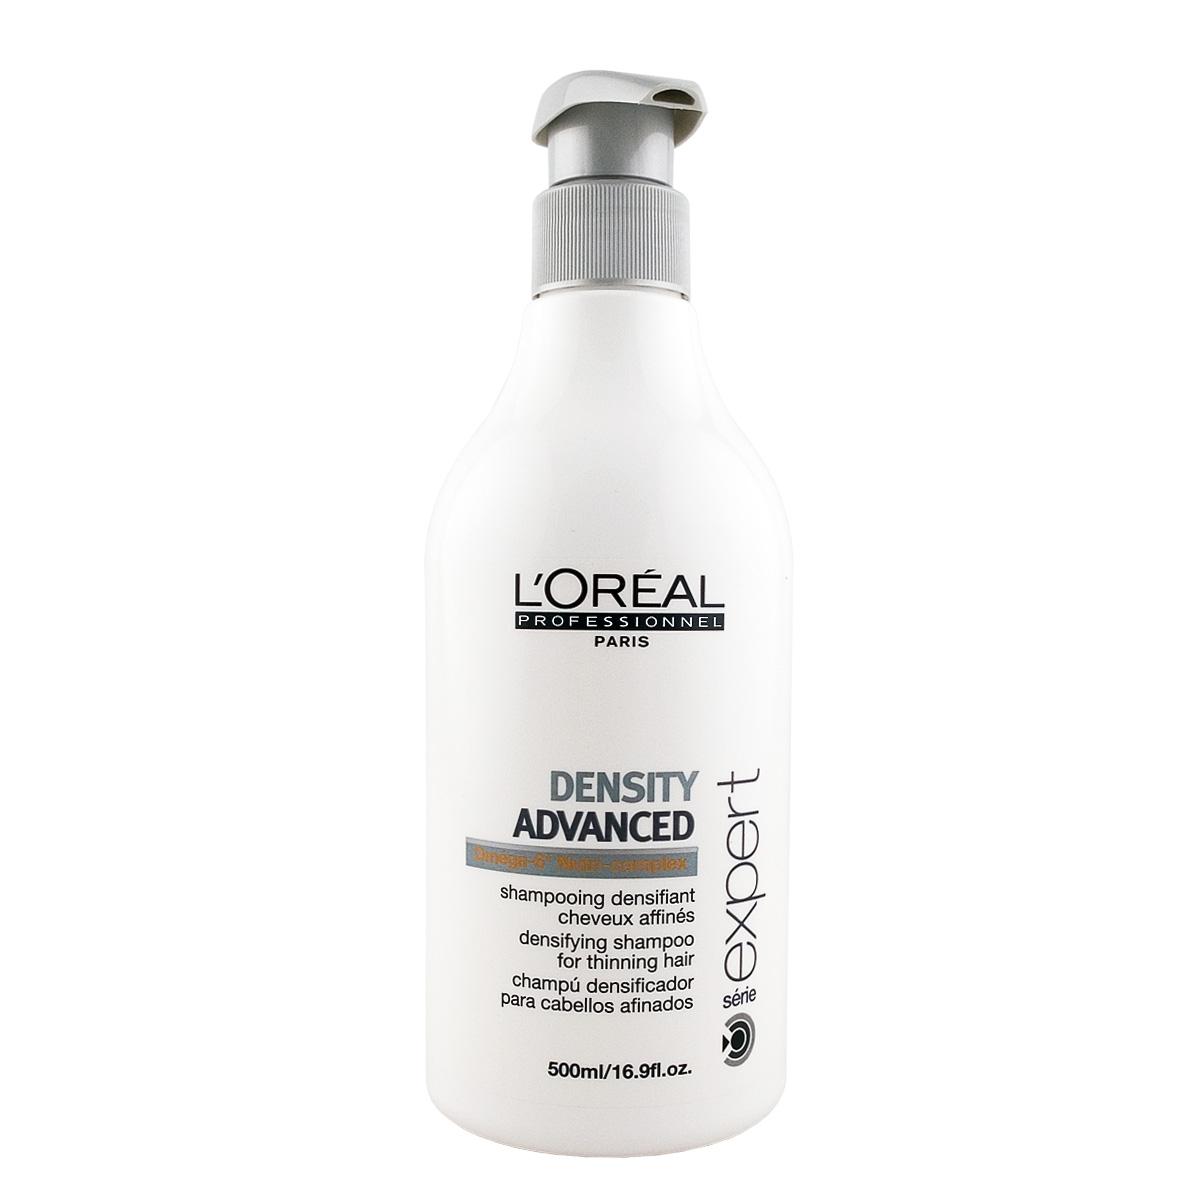 L´Oreal Paris Expert Density Advanced šampon pro obnovu hustoty vlasů 500 ml